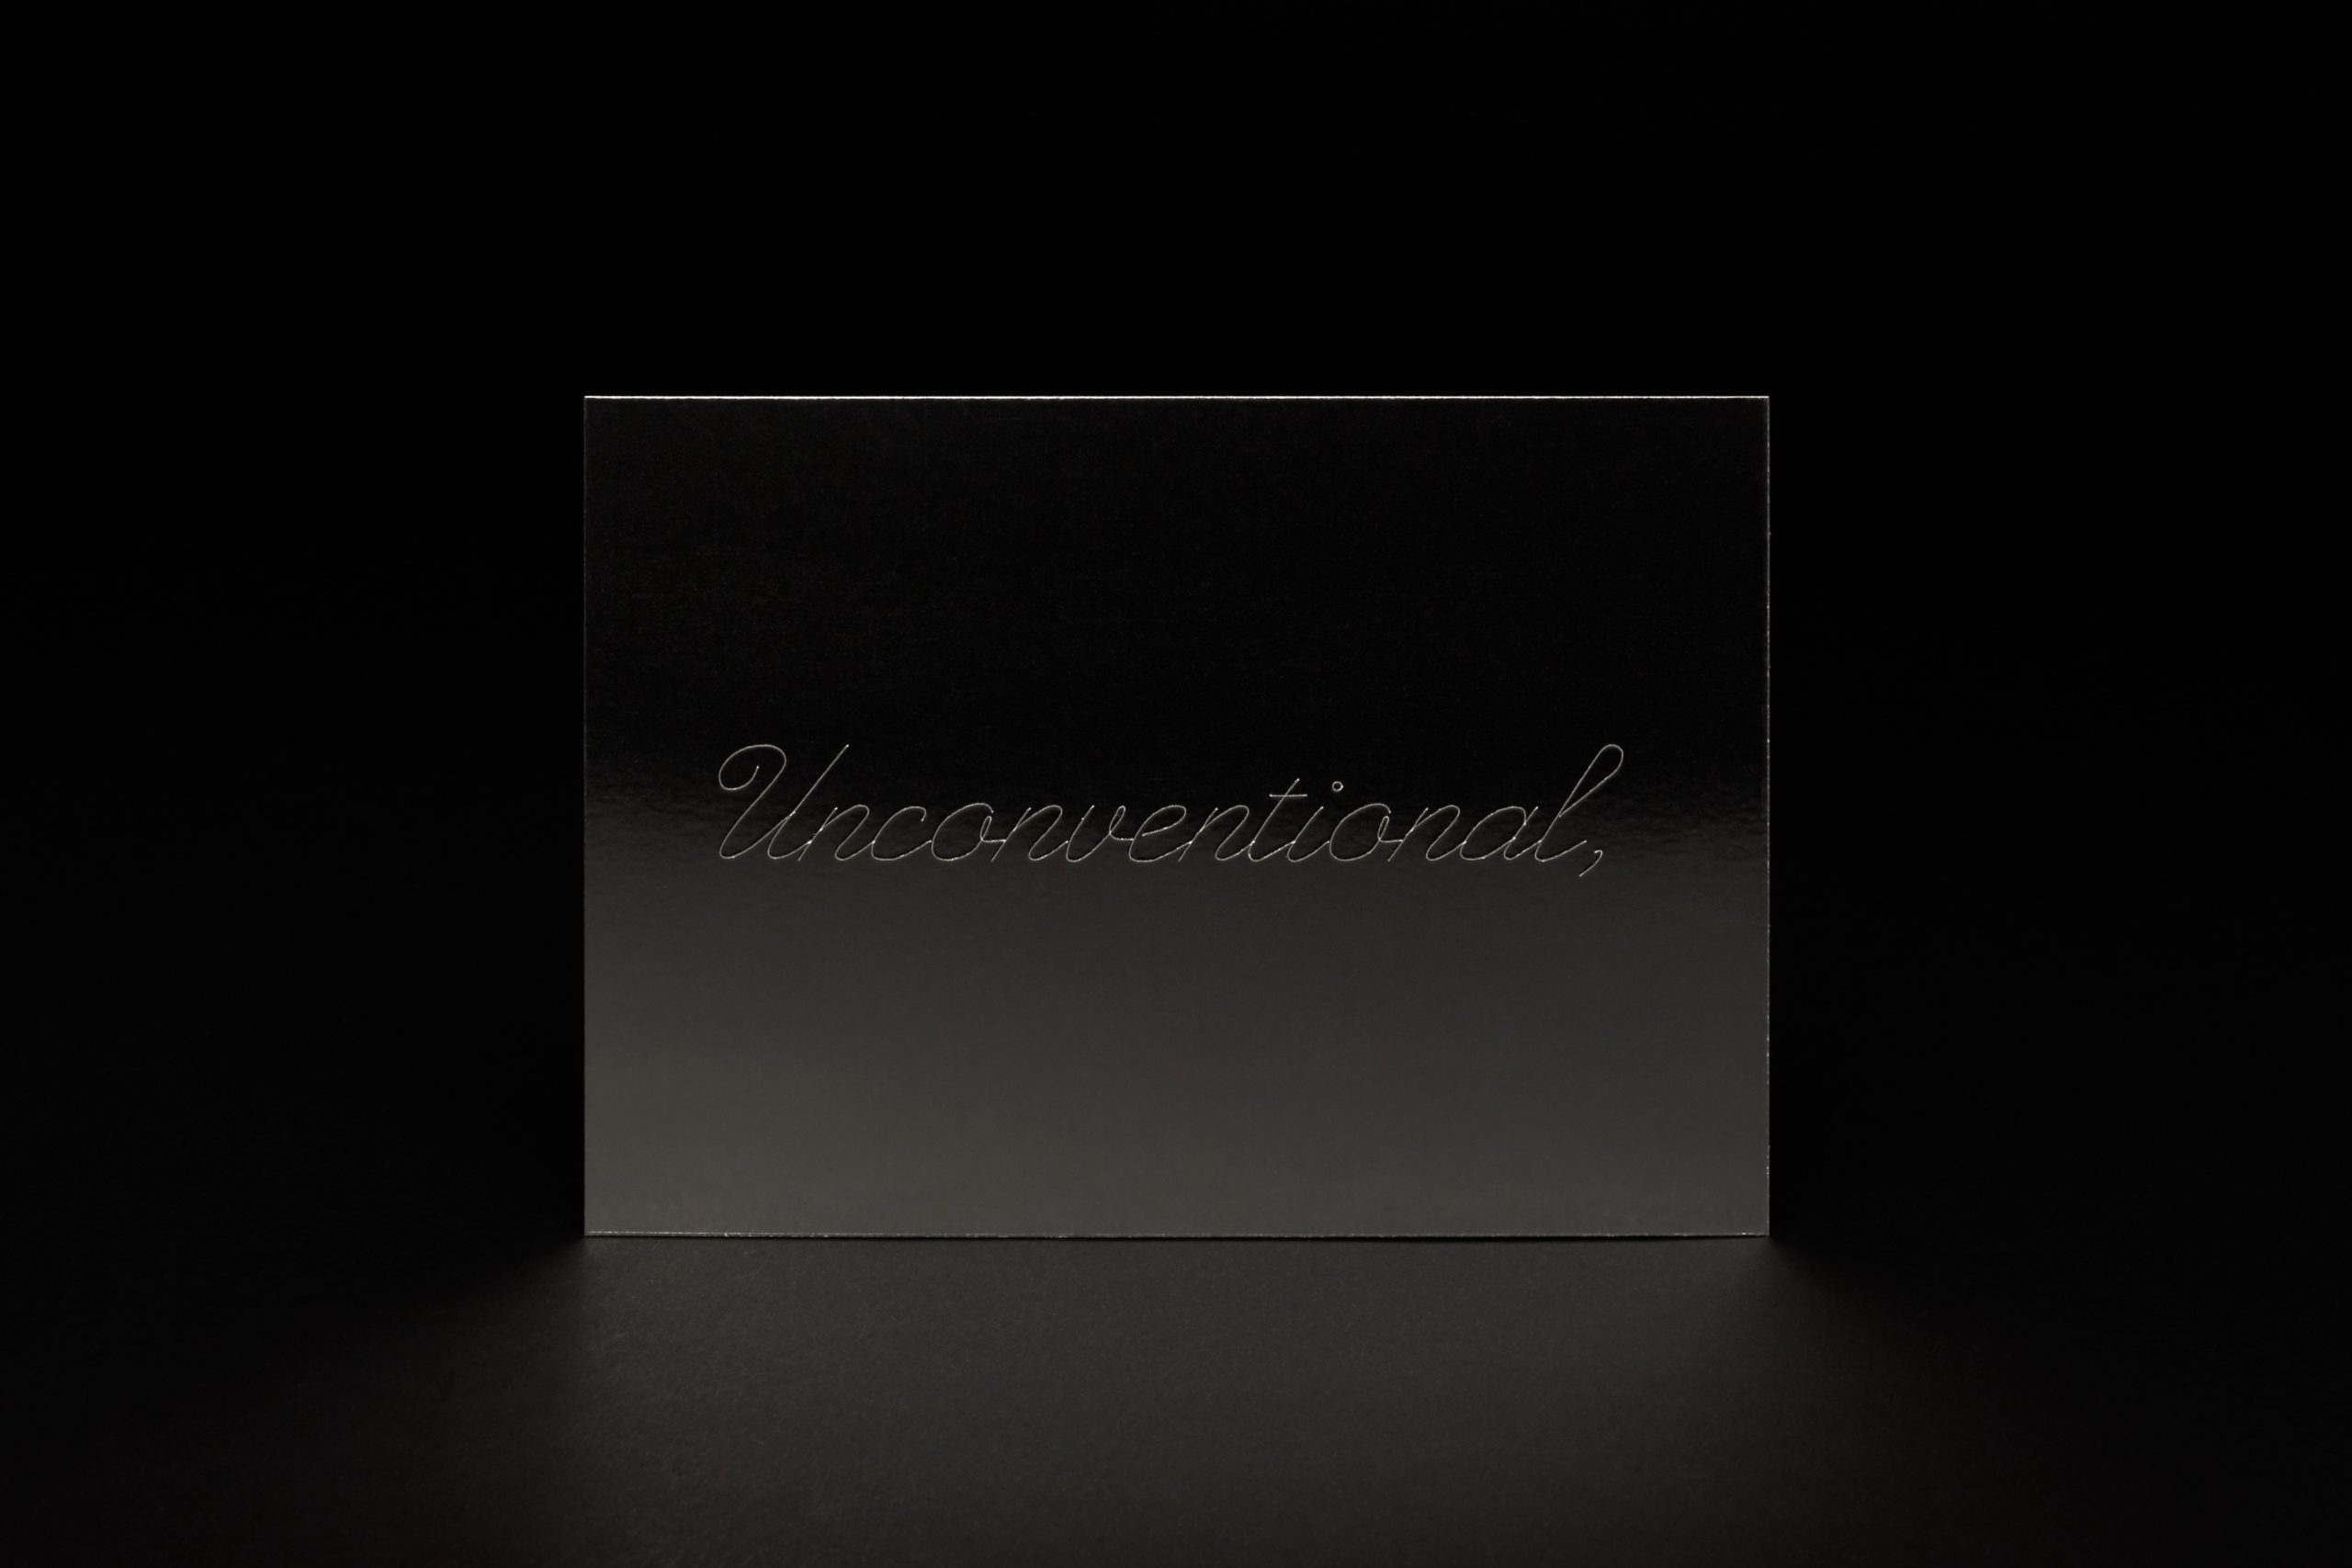 060317_DOTSY_Word_Card_ensemble_Unconventional